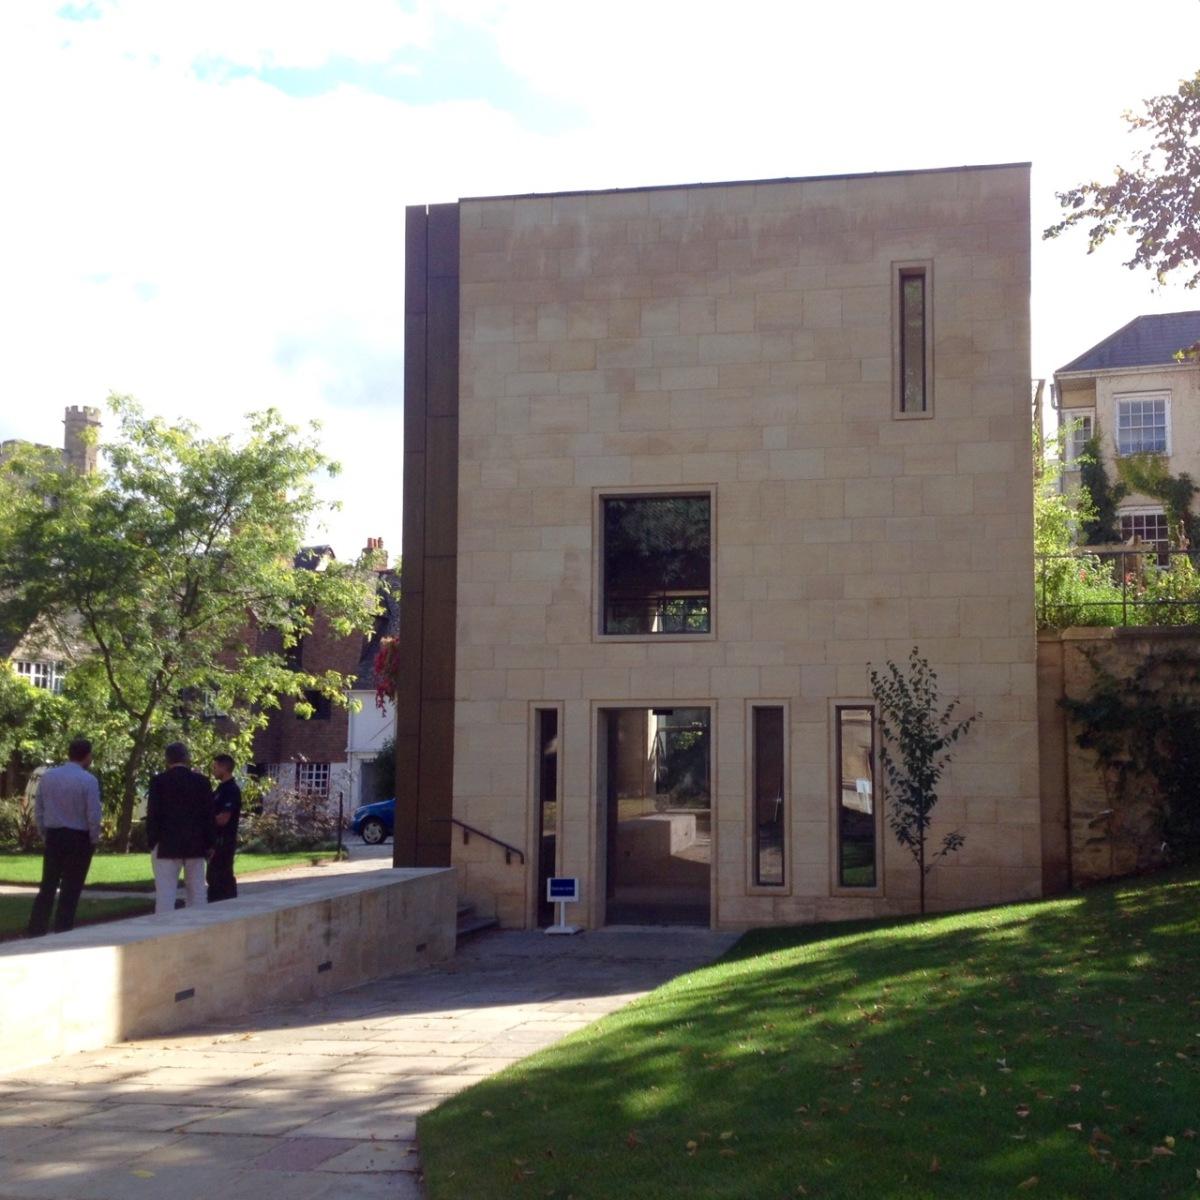 Wadham College - McCall MacBain Graduate Centre